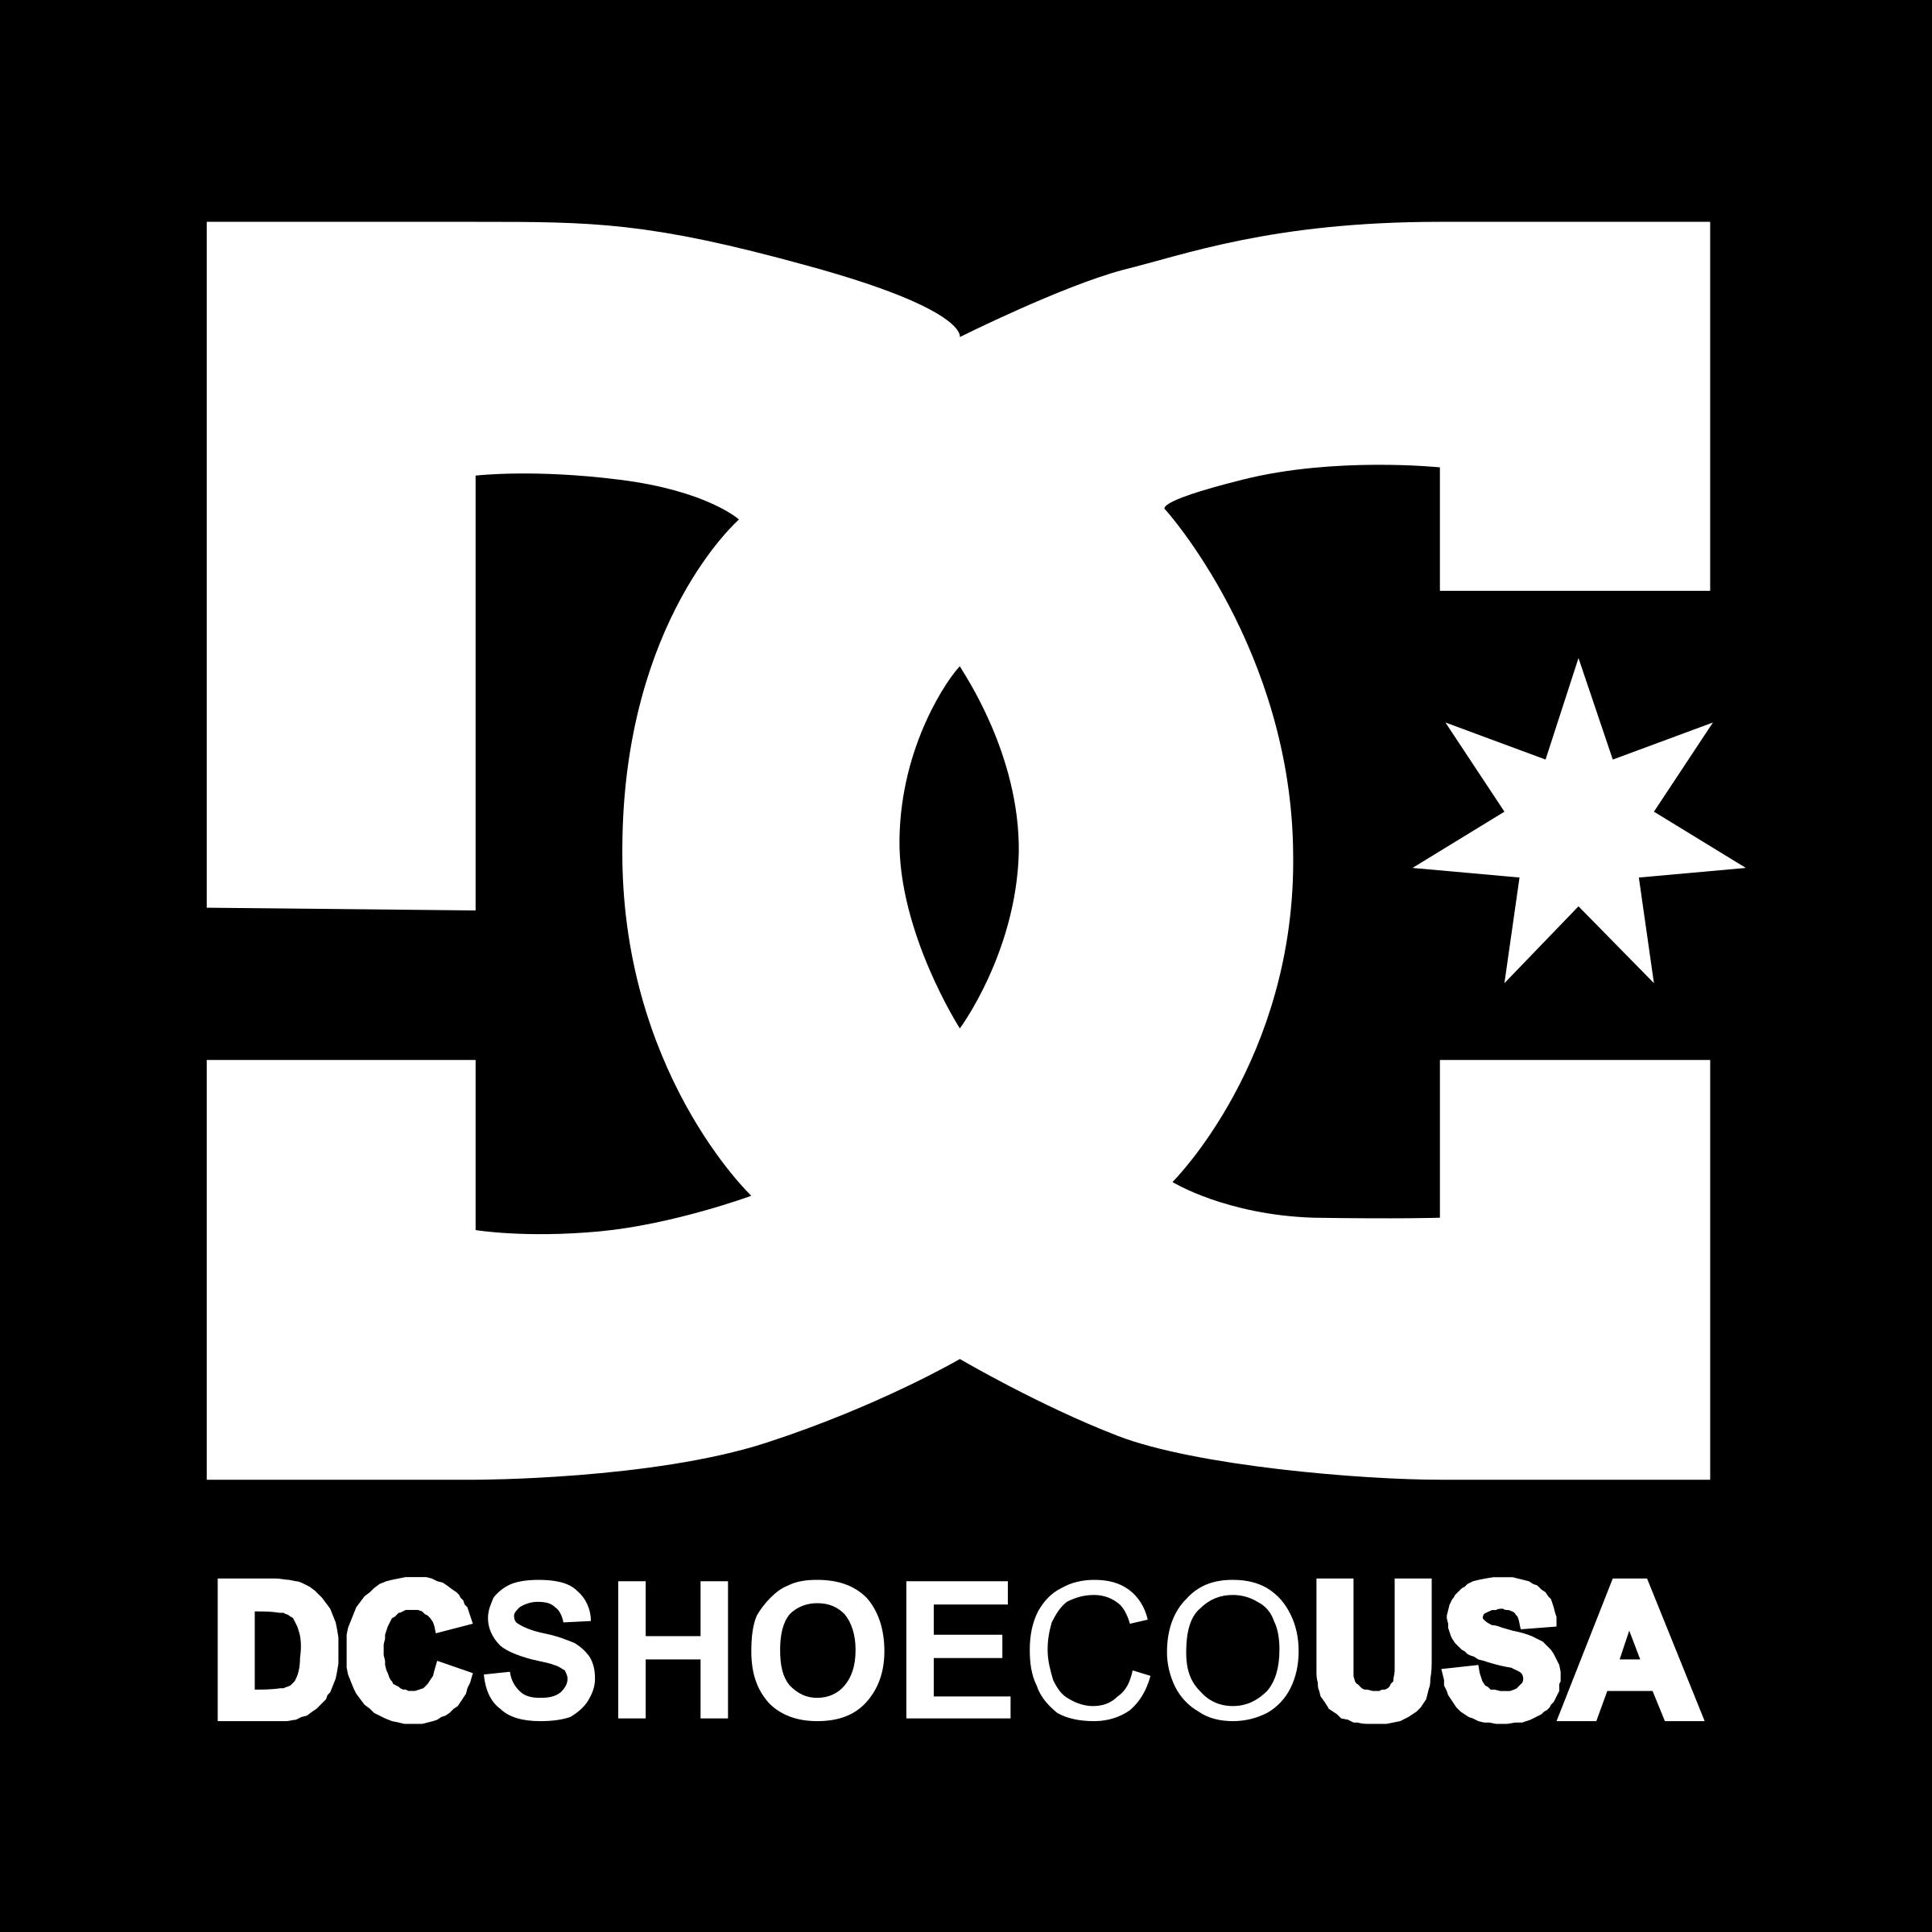 DC Shoe Co USA Logo PNG Transparent & SVG Vector.